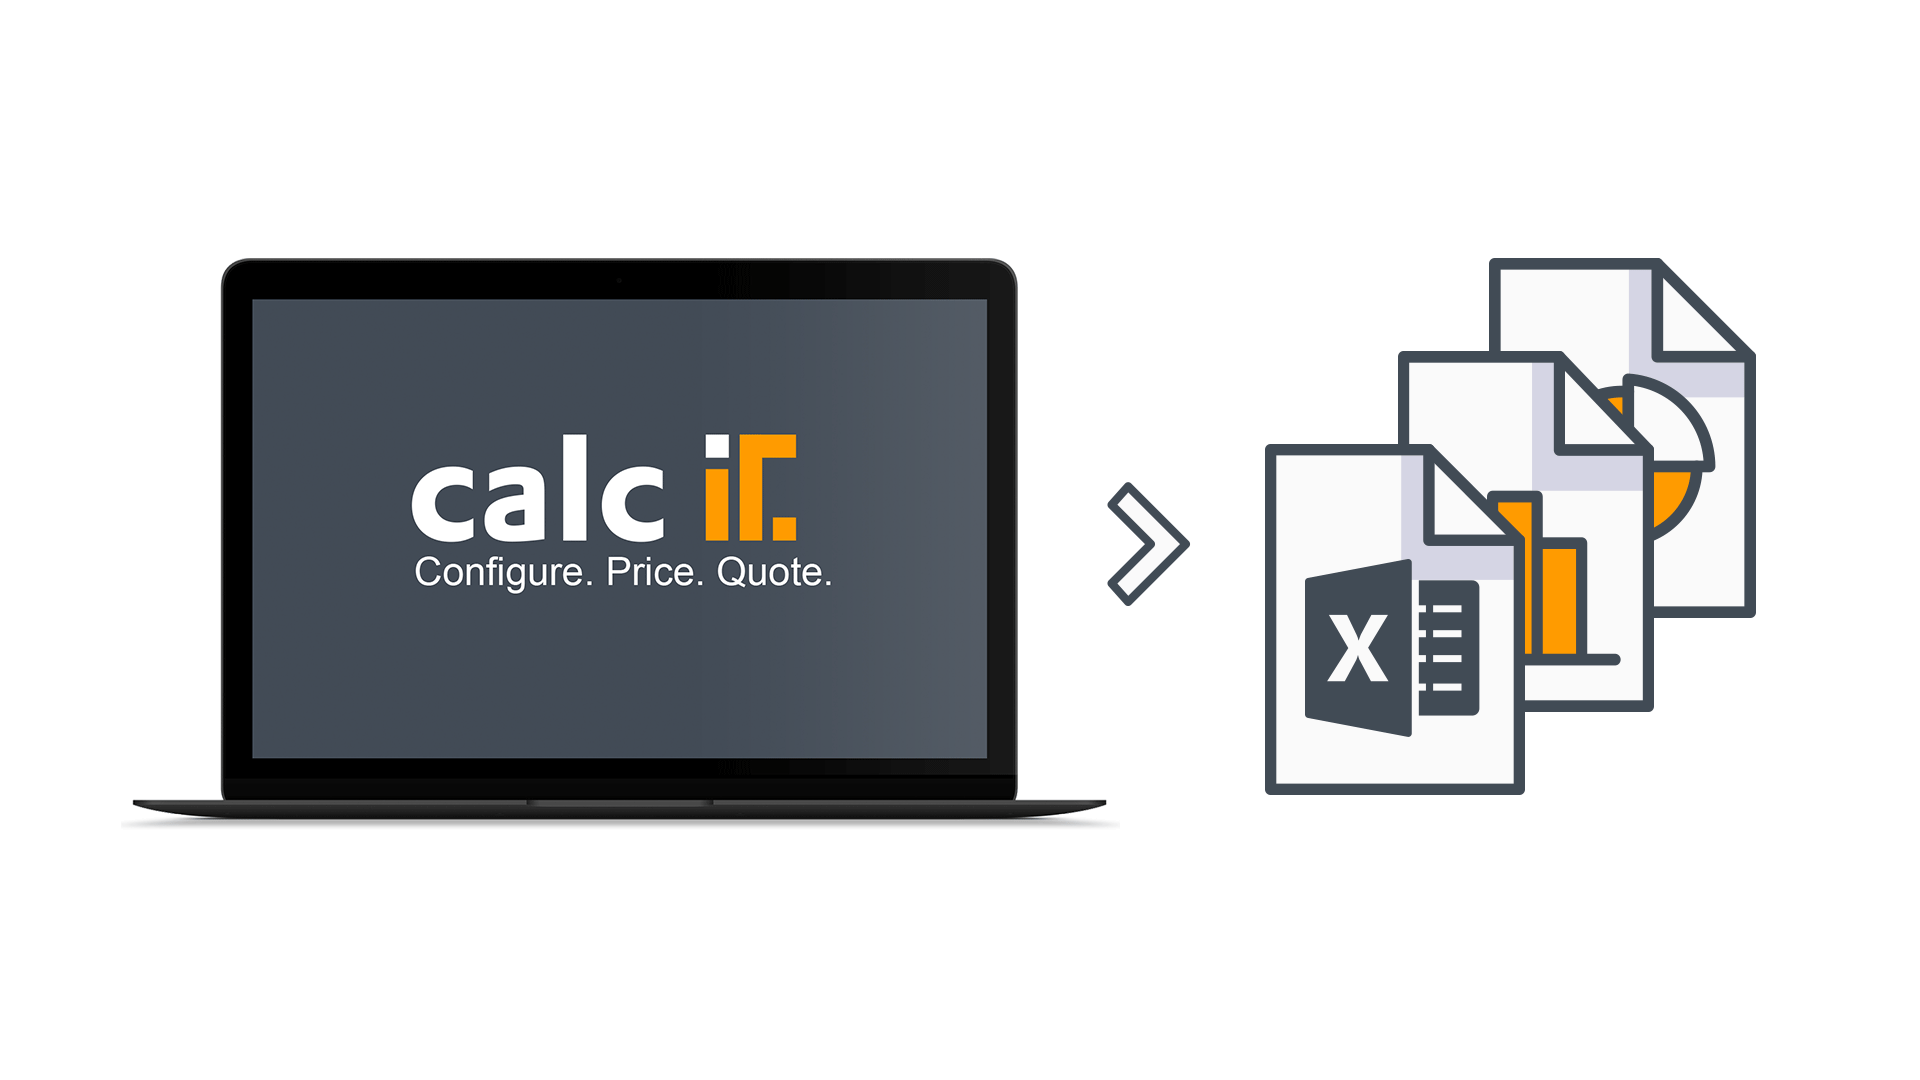 CPQ Reporting & Controlling mit calcIT: Umfangreiche Exportmöglichkeiten